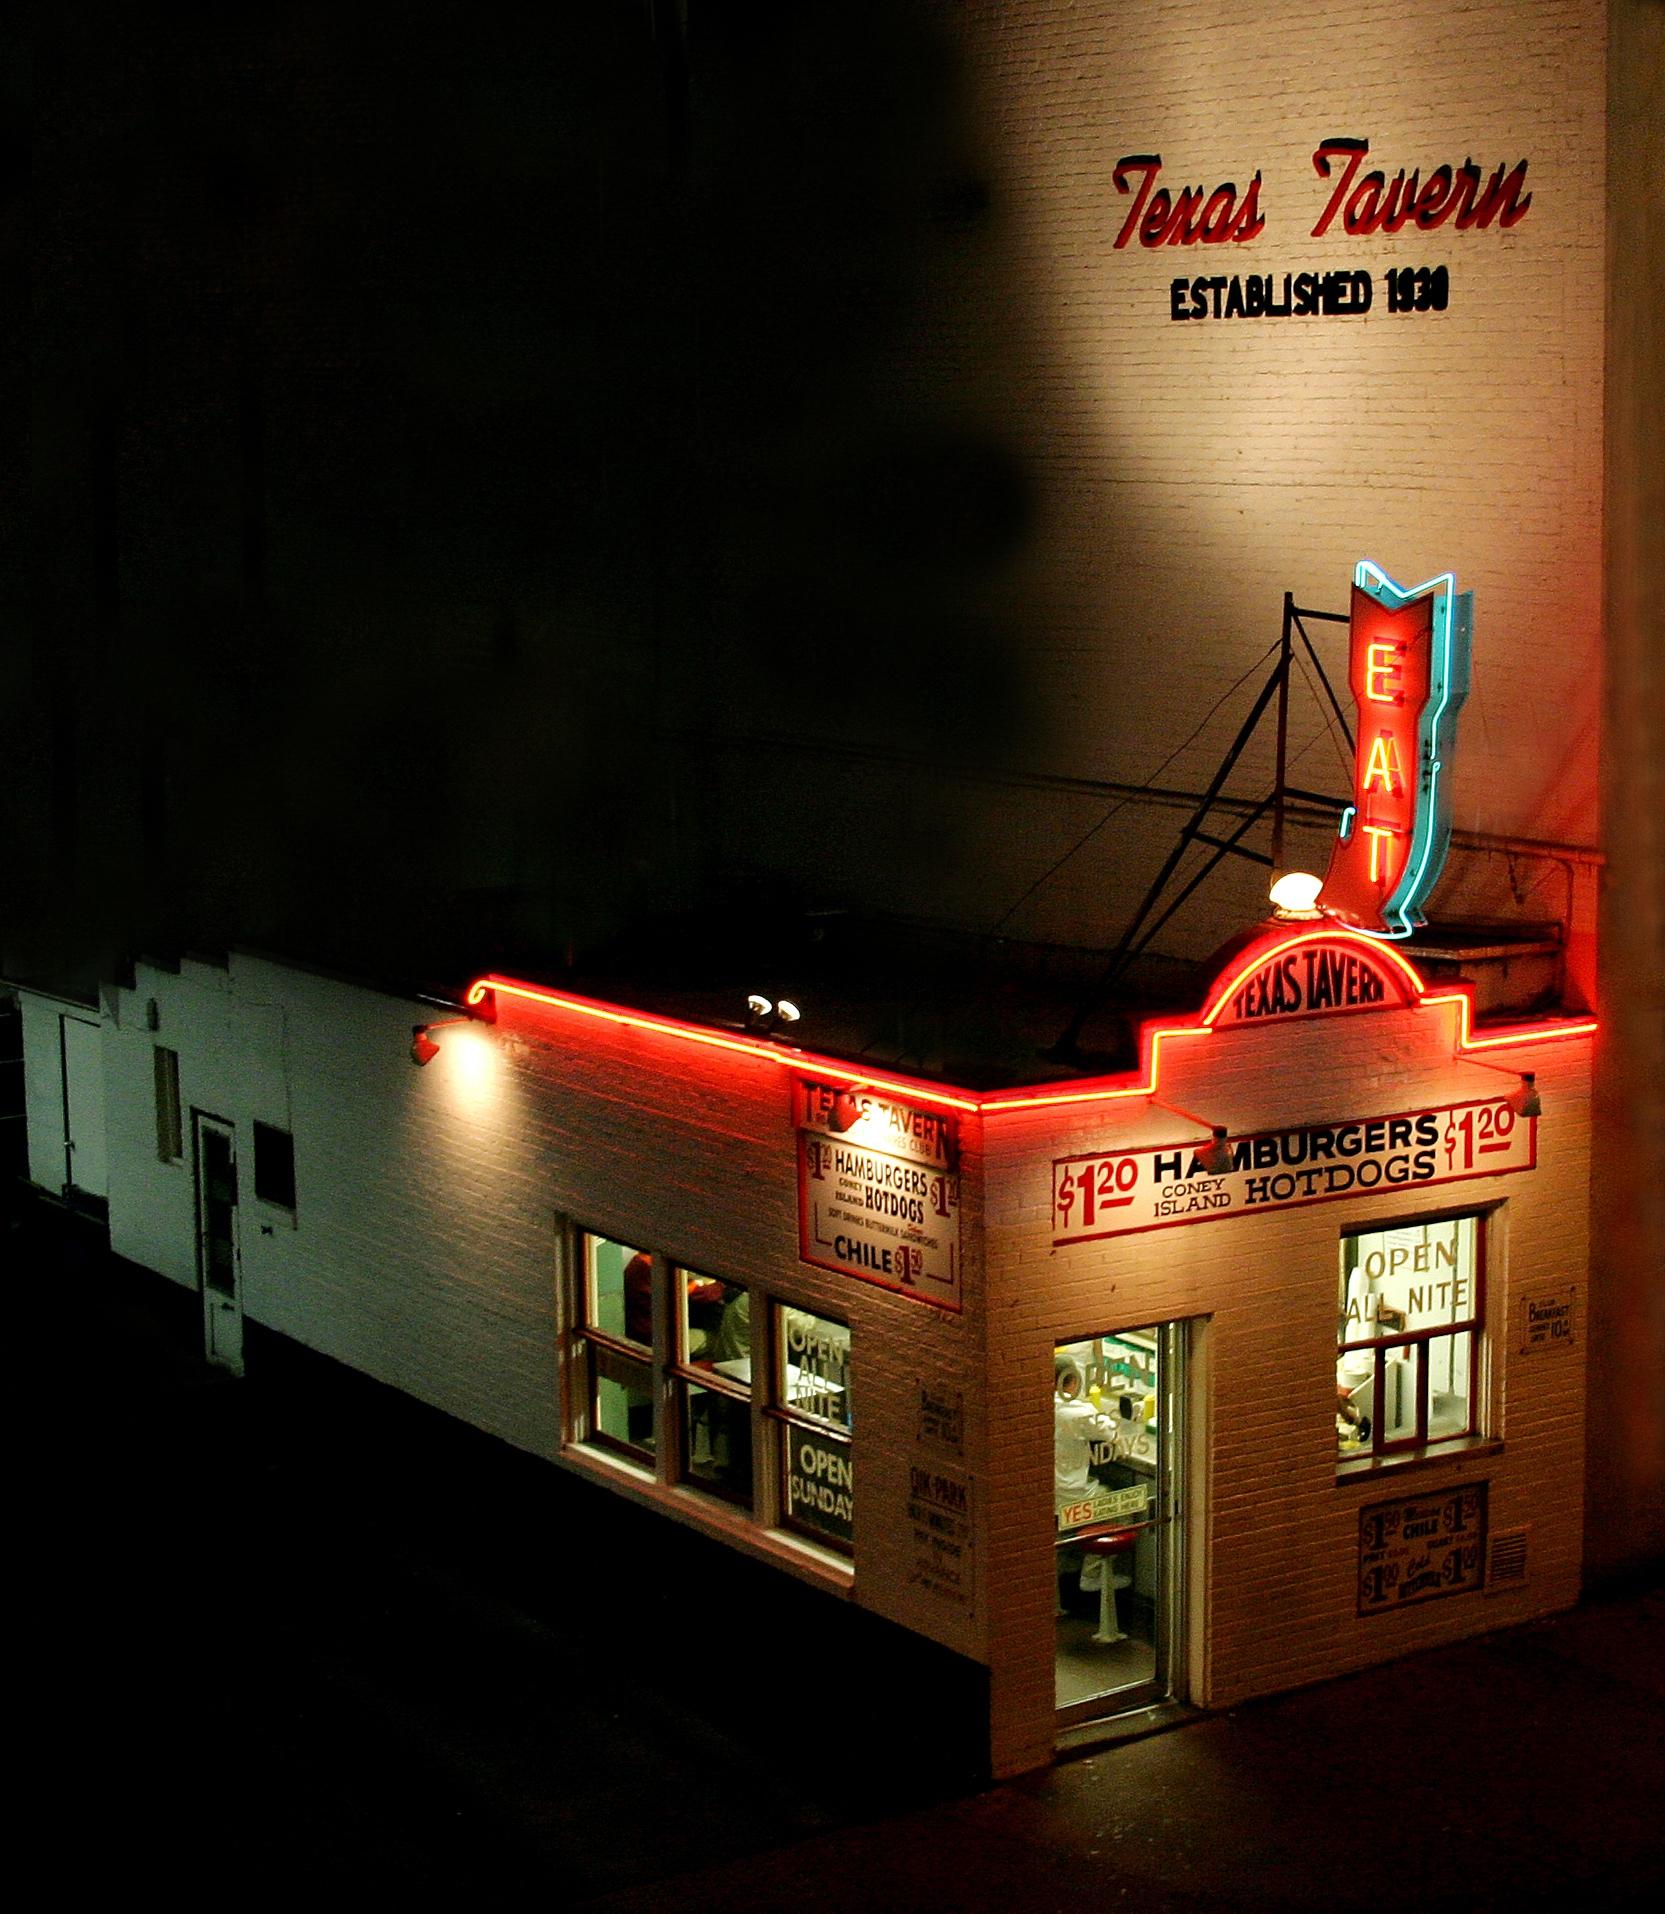 TT night Photo by JBull